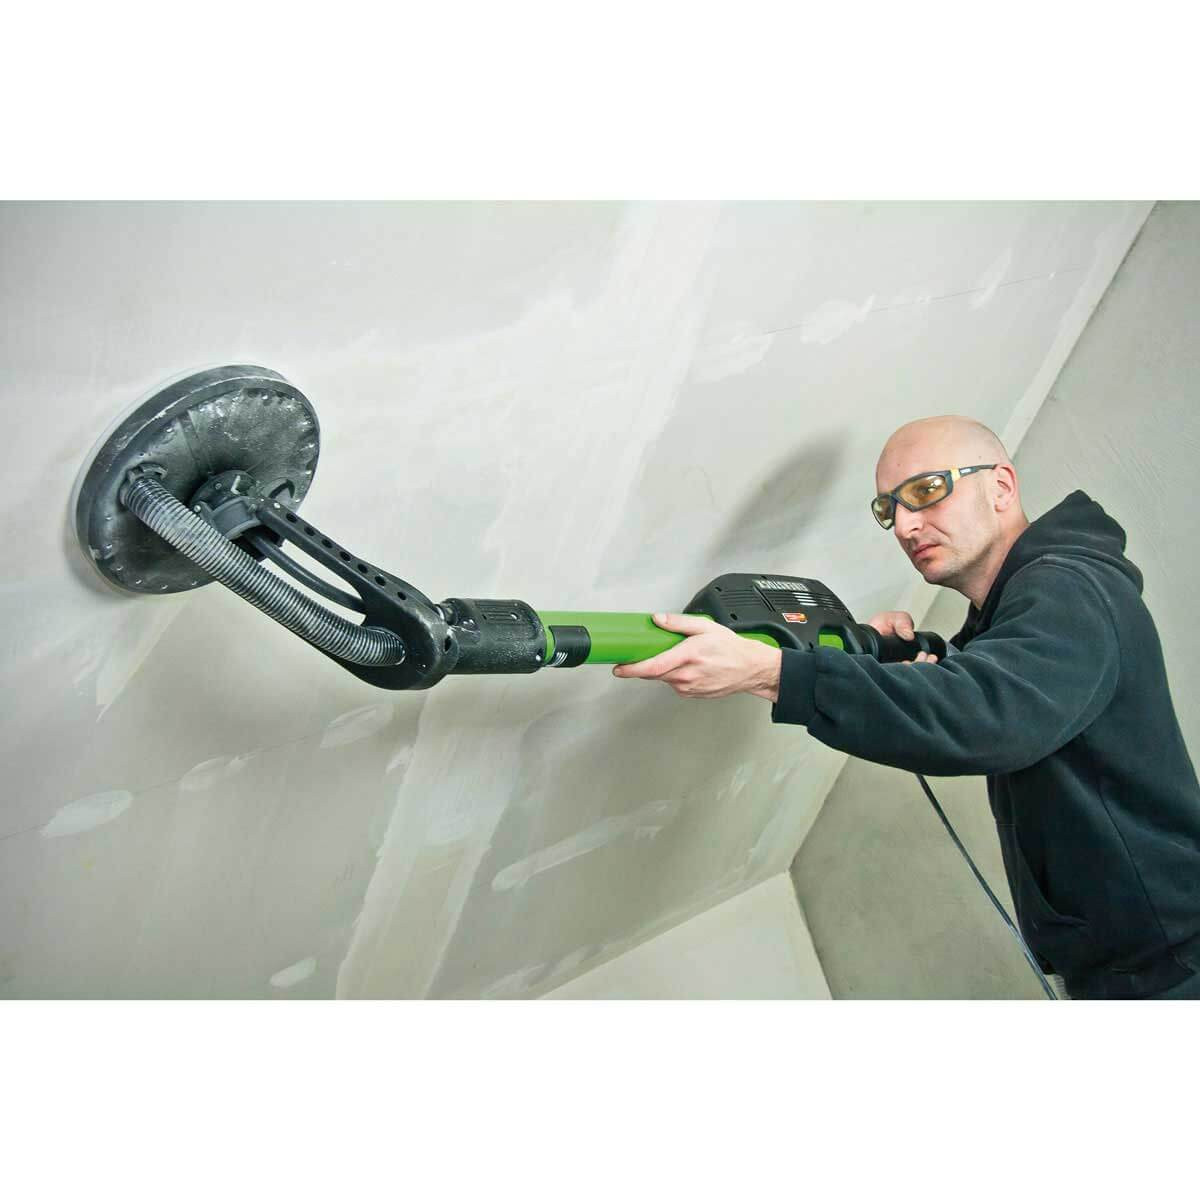 9 inch Dry Wall Sander